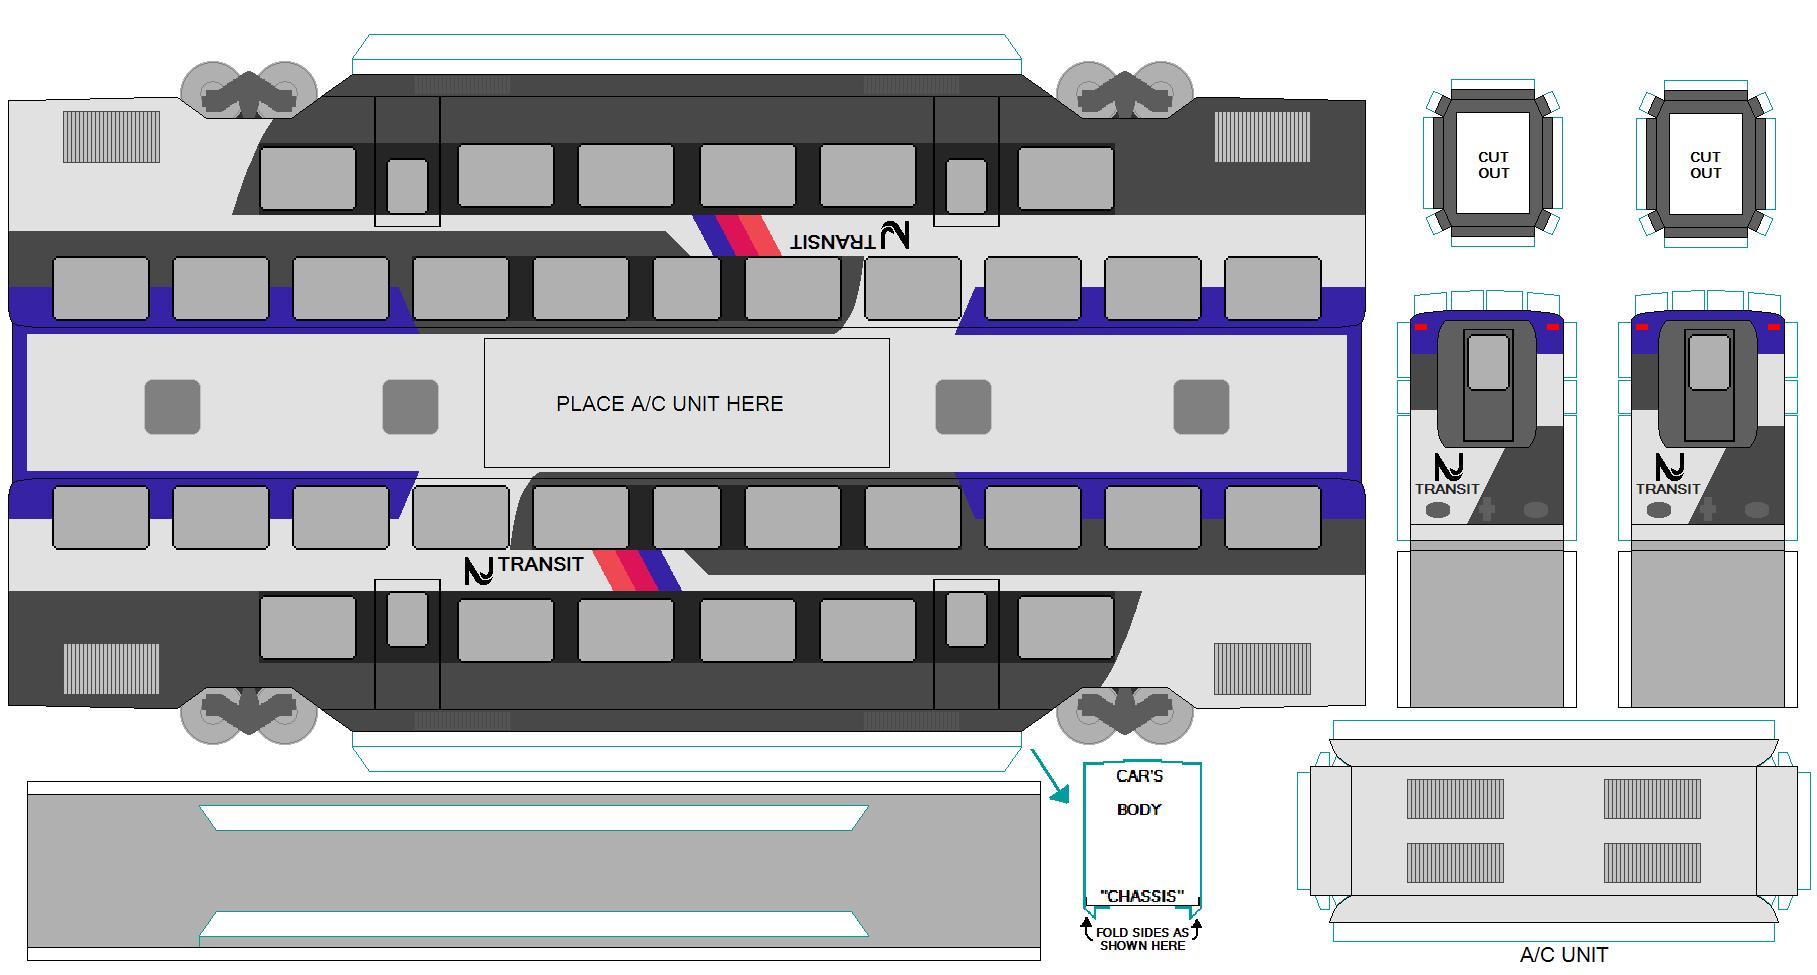 NewJersey__livery3__bi_level_train_car.PNG